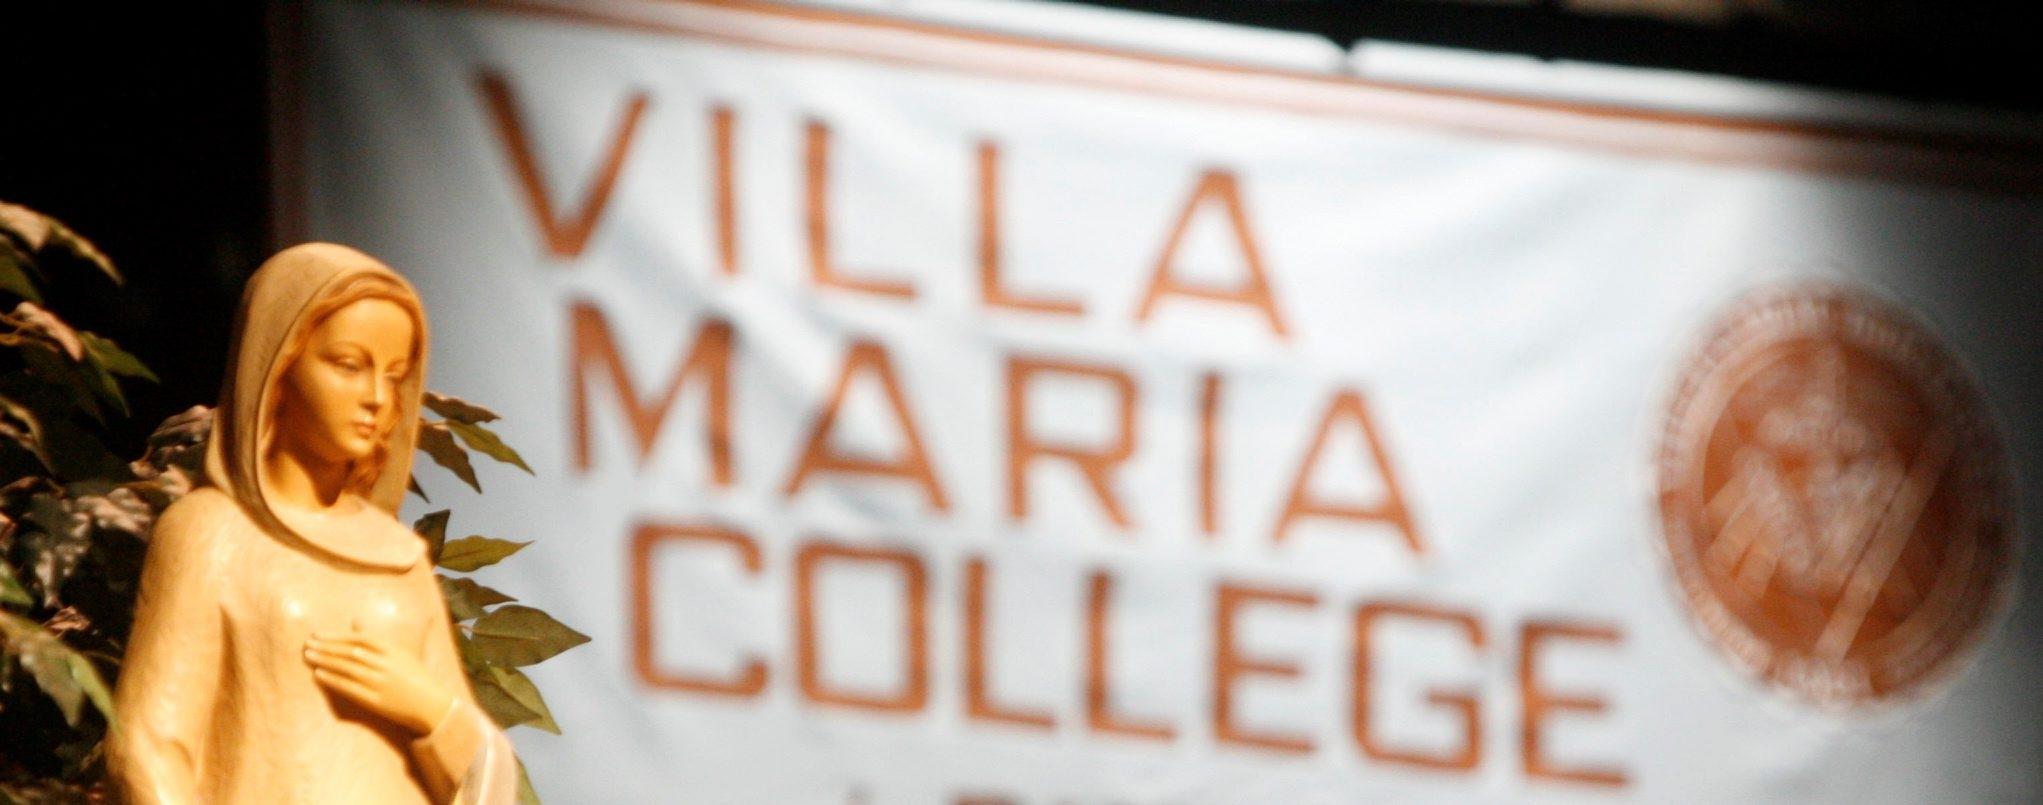 Villa Maria College in Cheektowaga eyes changes in attempt to grow enrollment.   (Buffalo News, Robert Kirkham file photo)